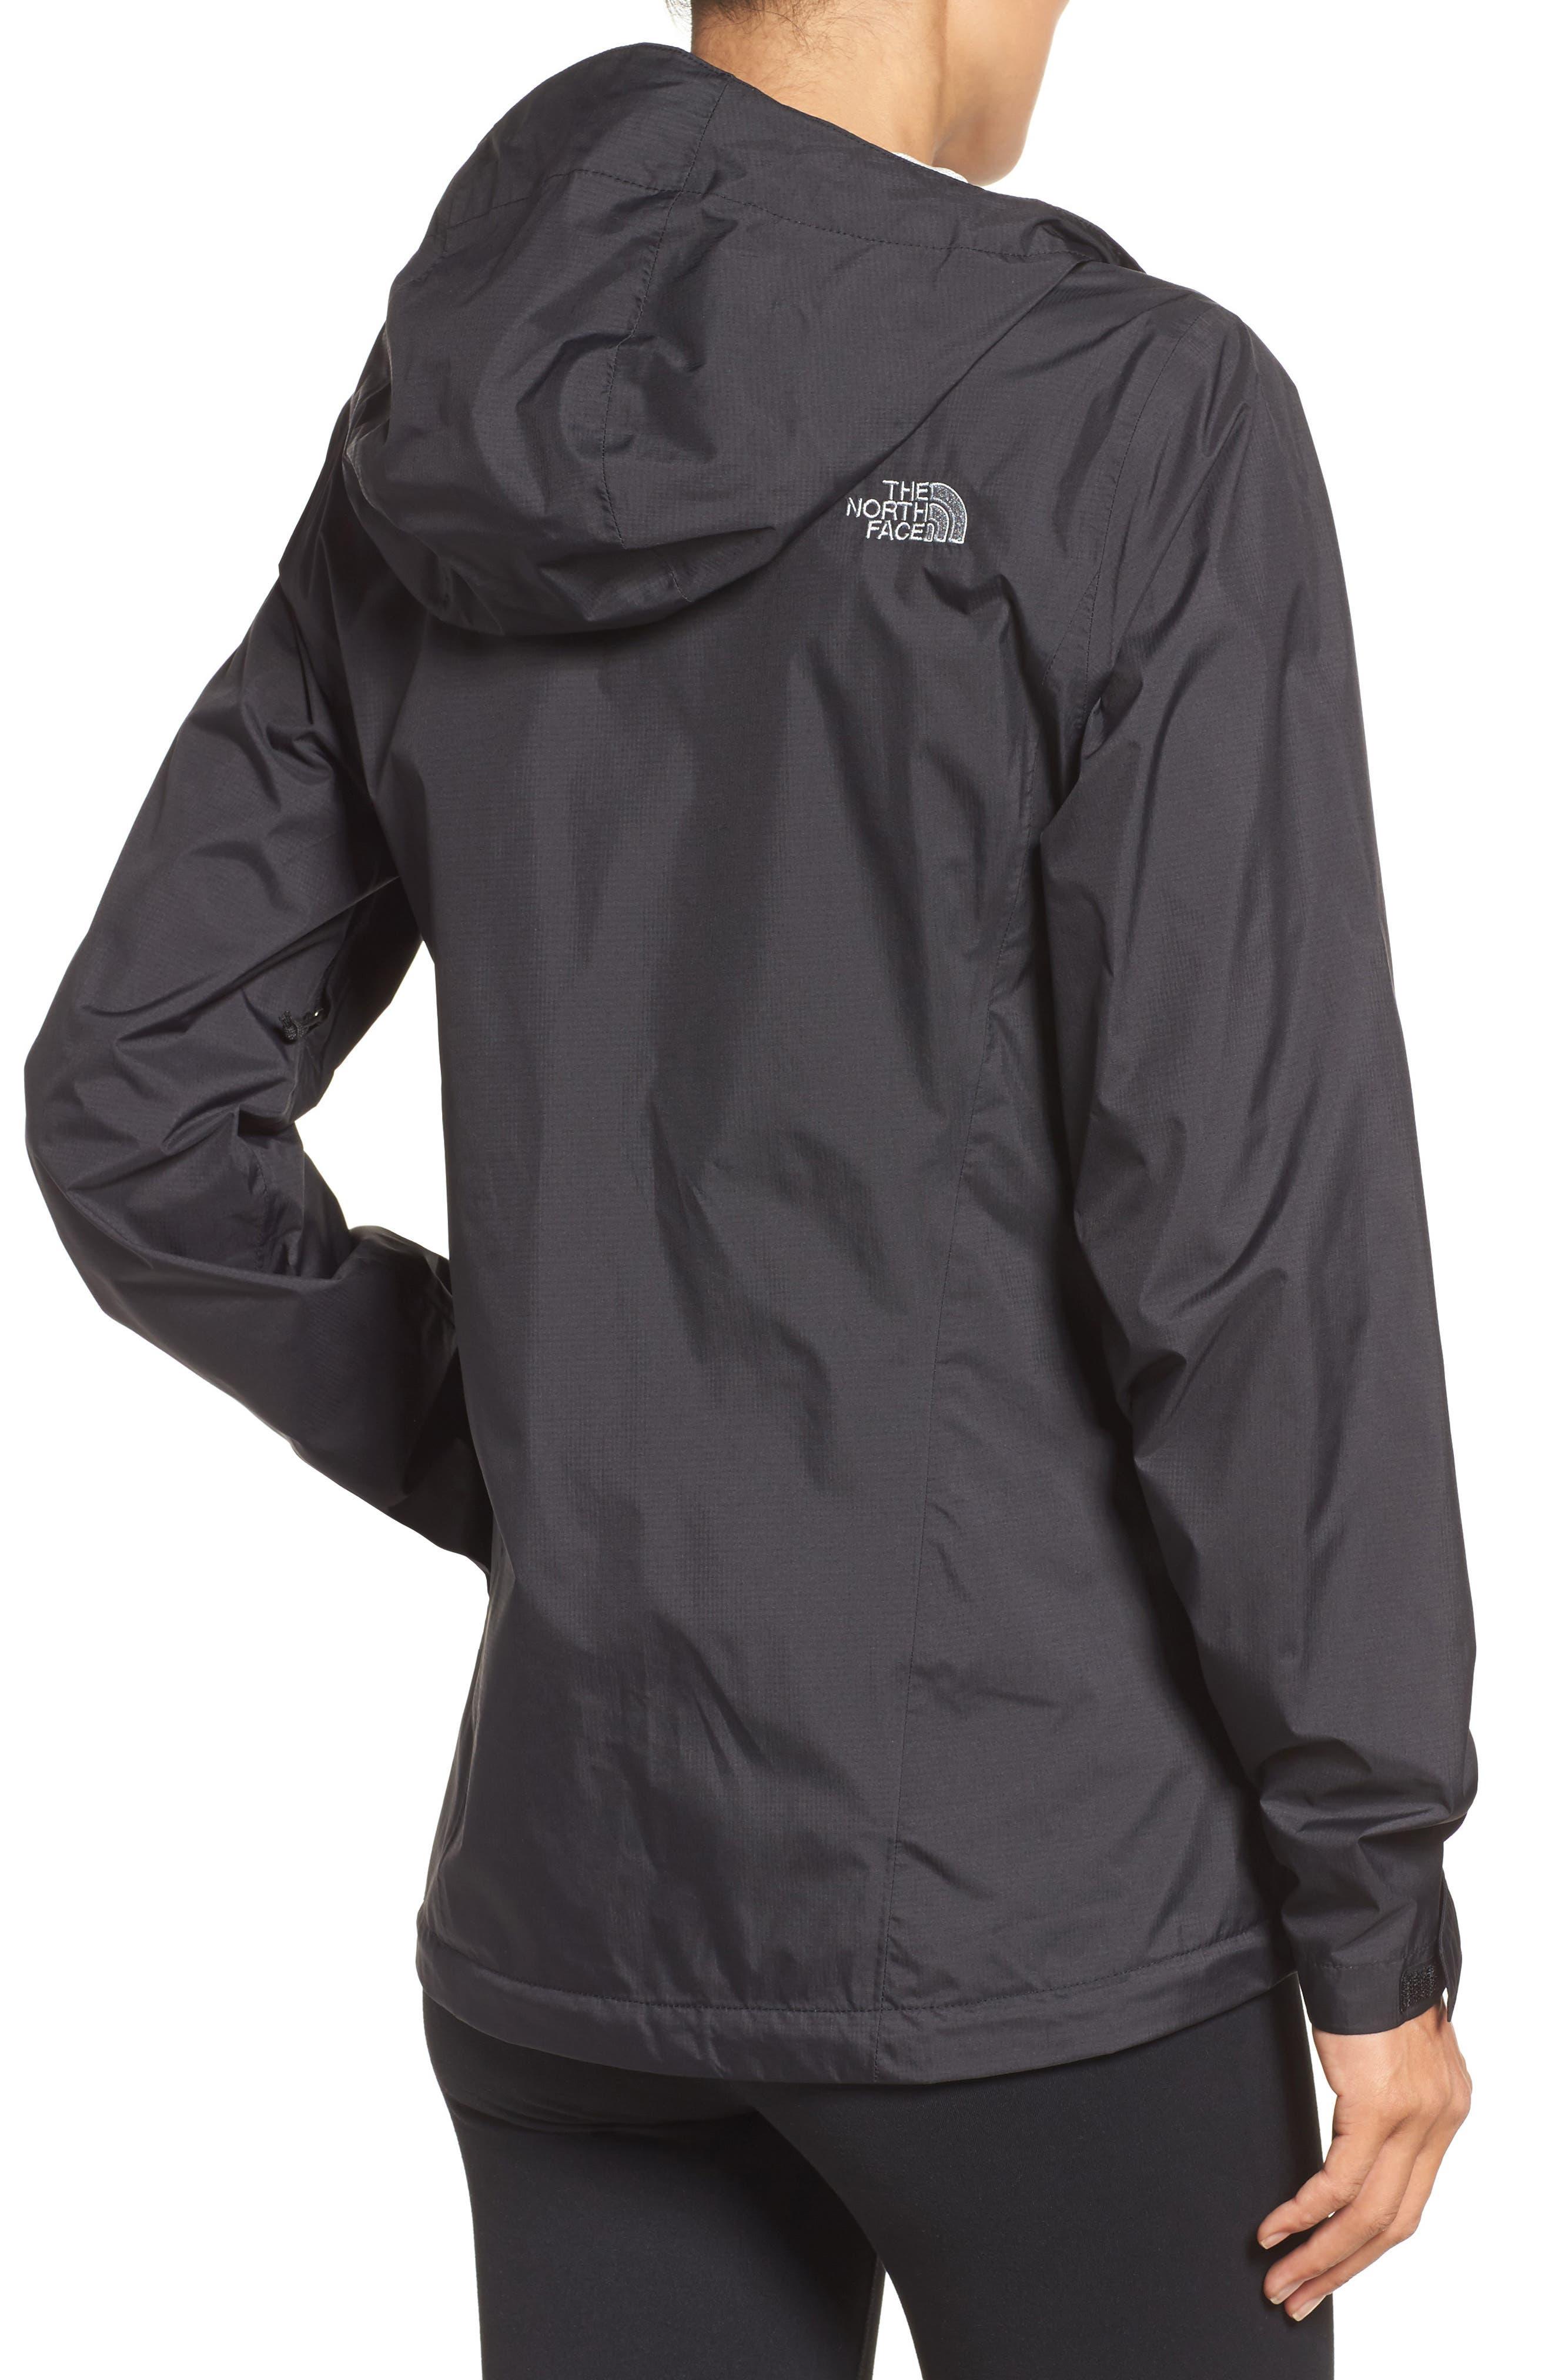 Venture 2 Waterproof Jacket,                             Alternate thumbnail 2, color,                             Tnf Black